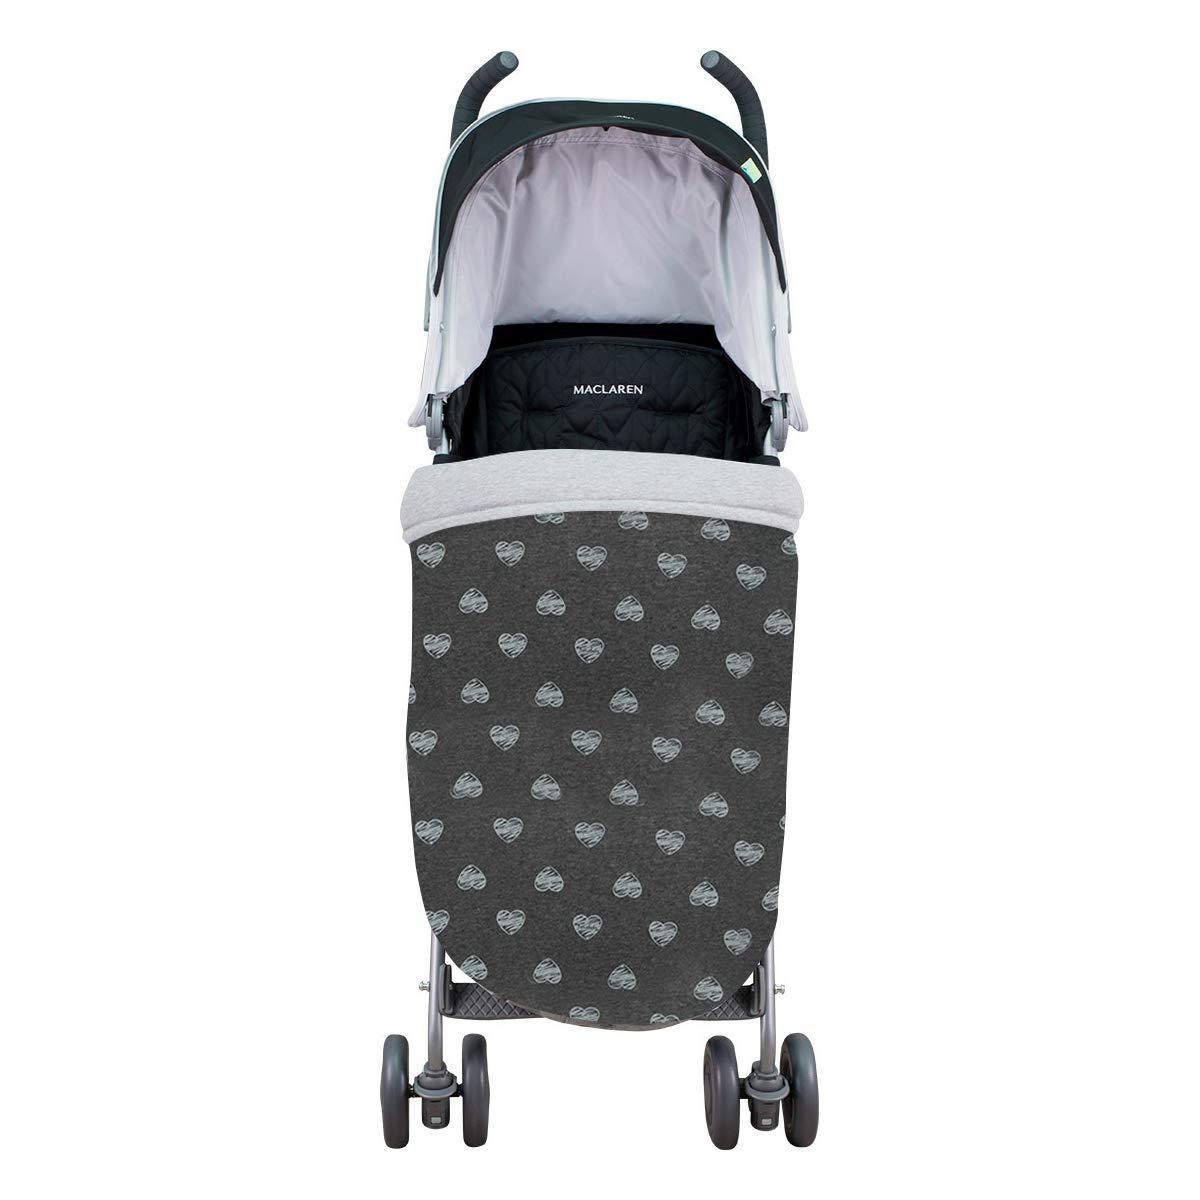 Janabebé Universal Baby Blanket Footmuff for Pushchairs (Blue Heart, Cotton)